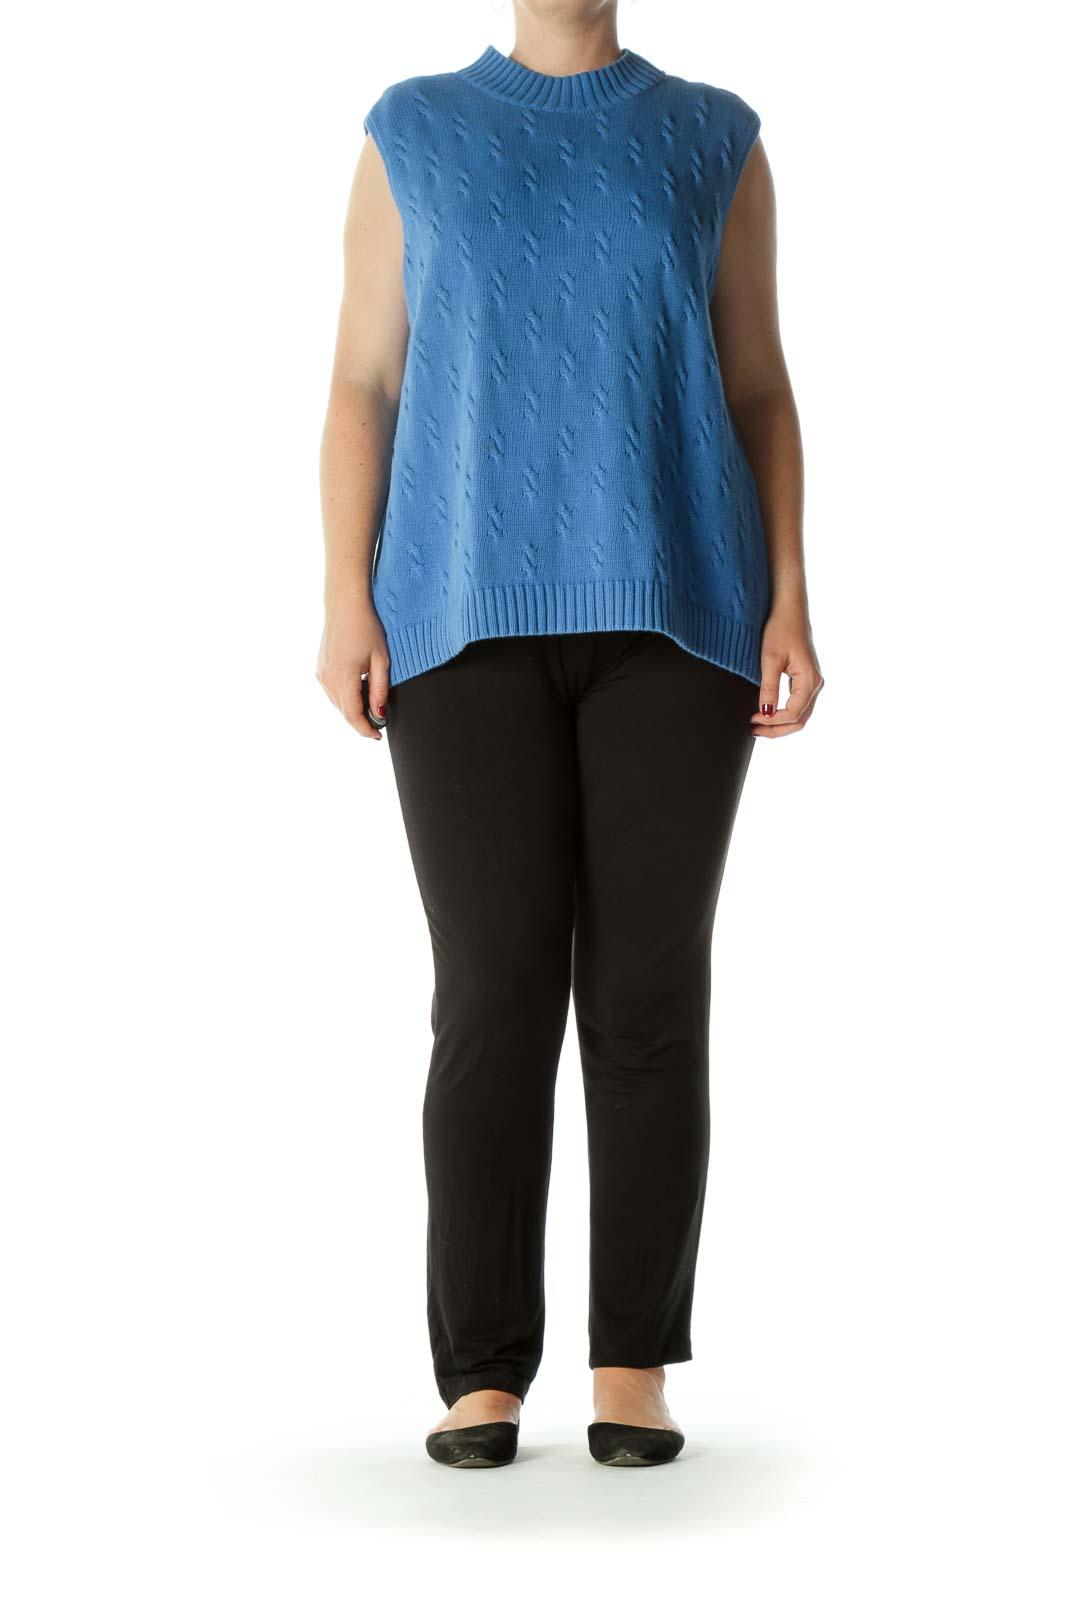 Blue 100% Cotton Round Neck Knit Stretch Sweater Vest